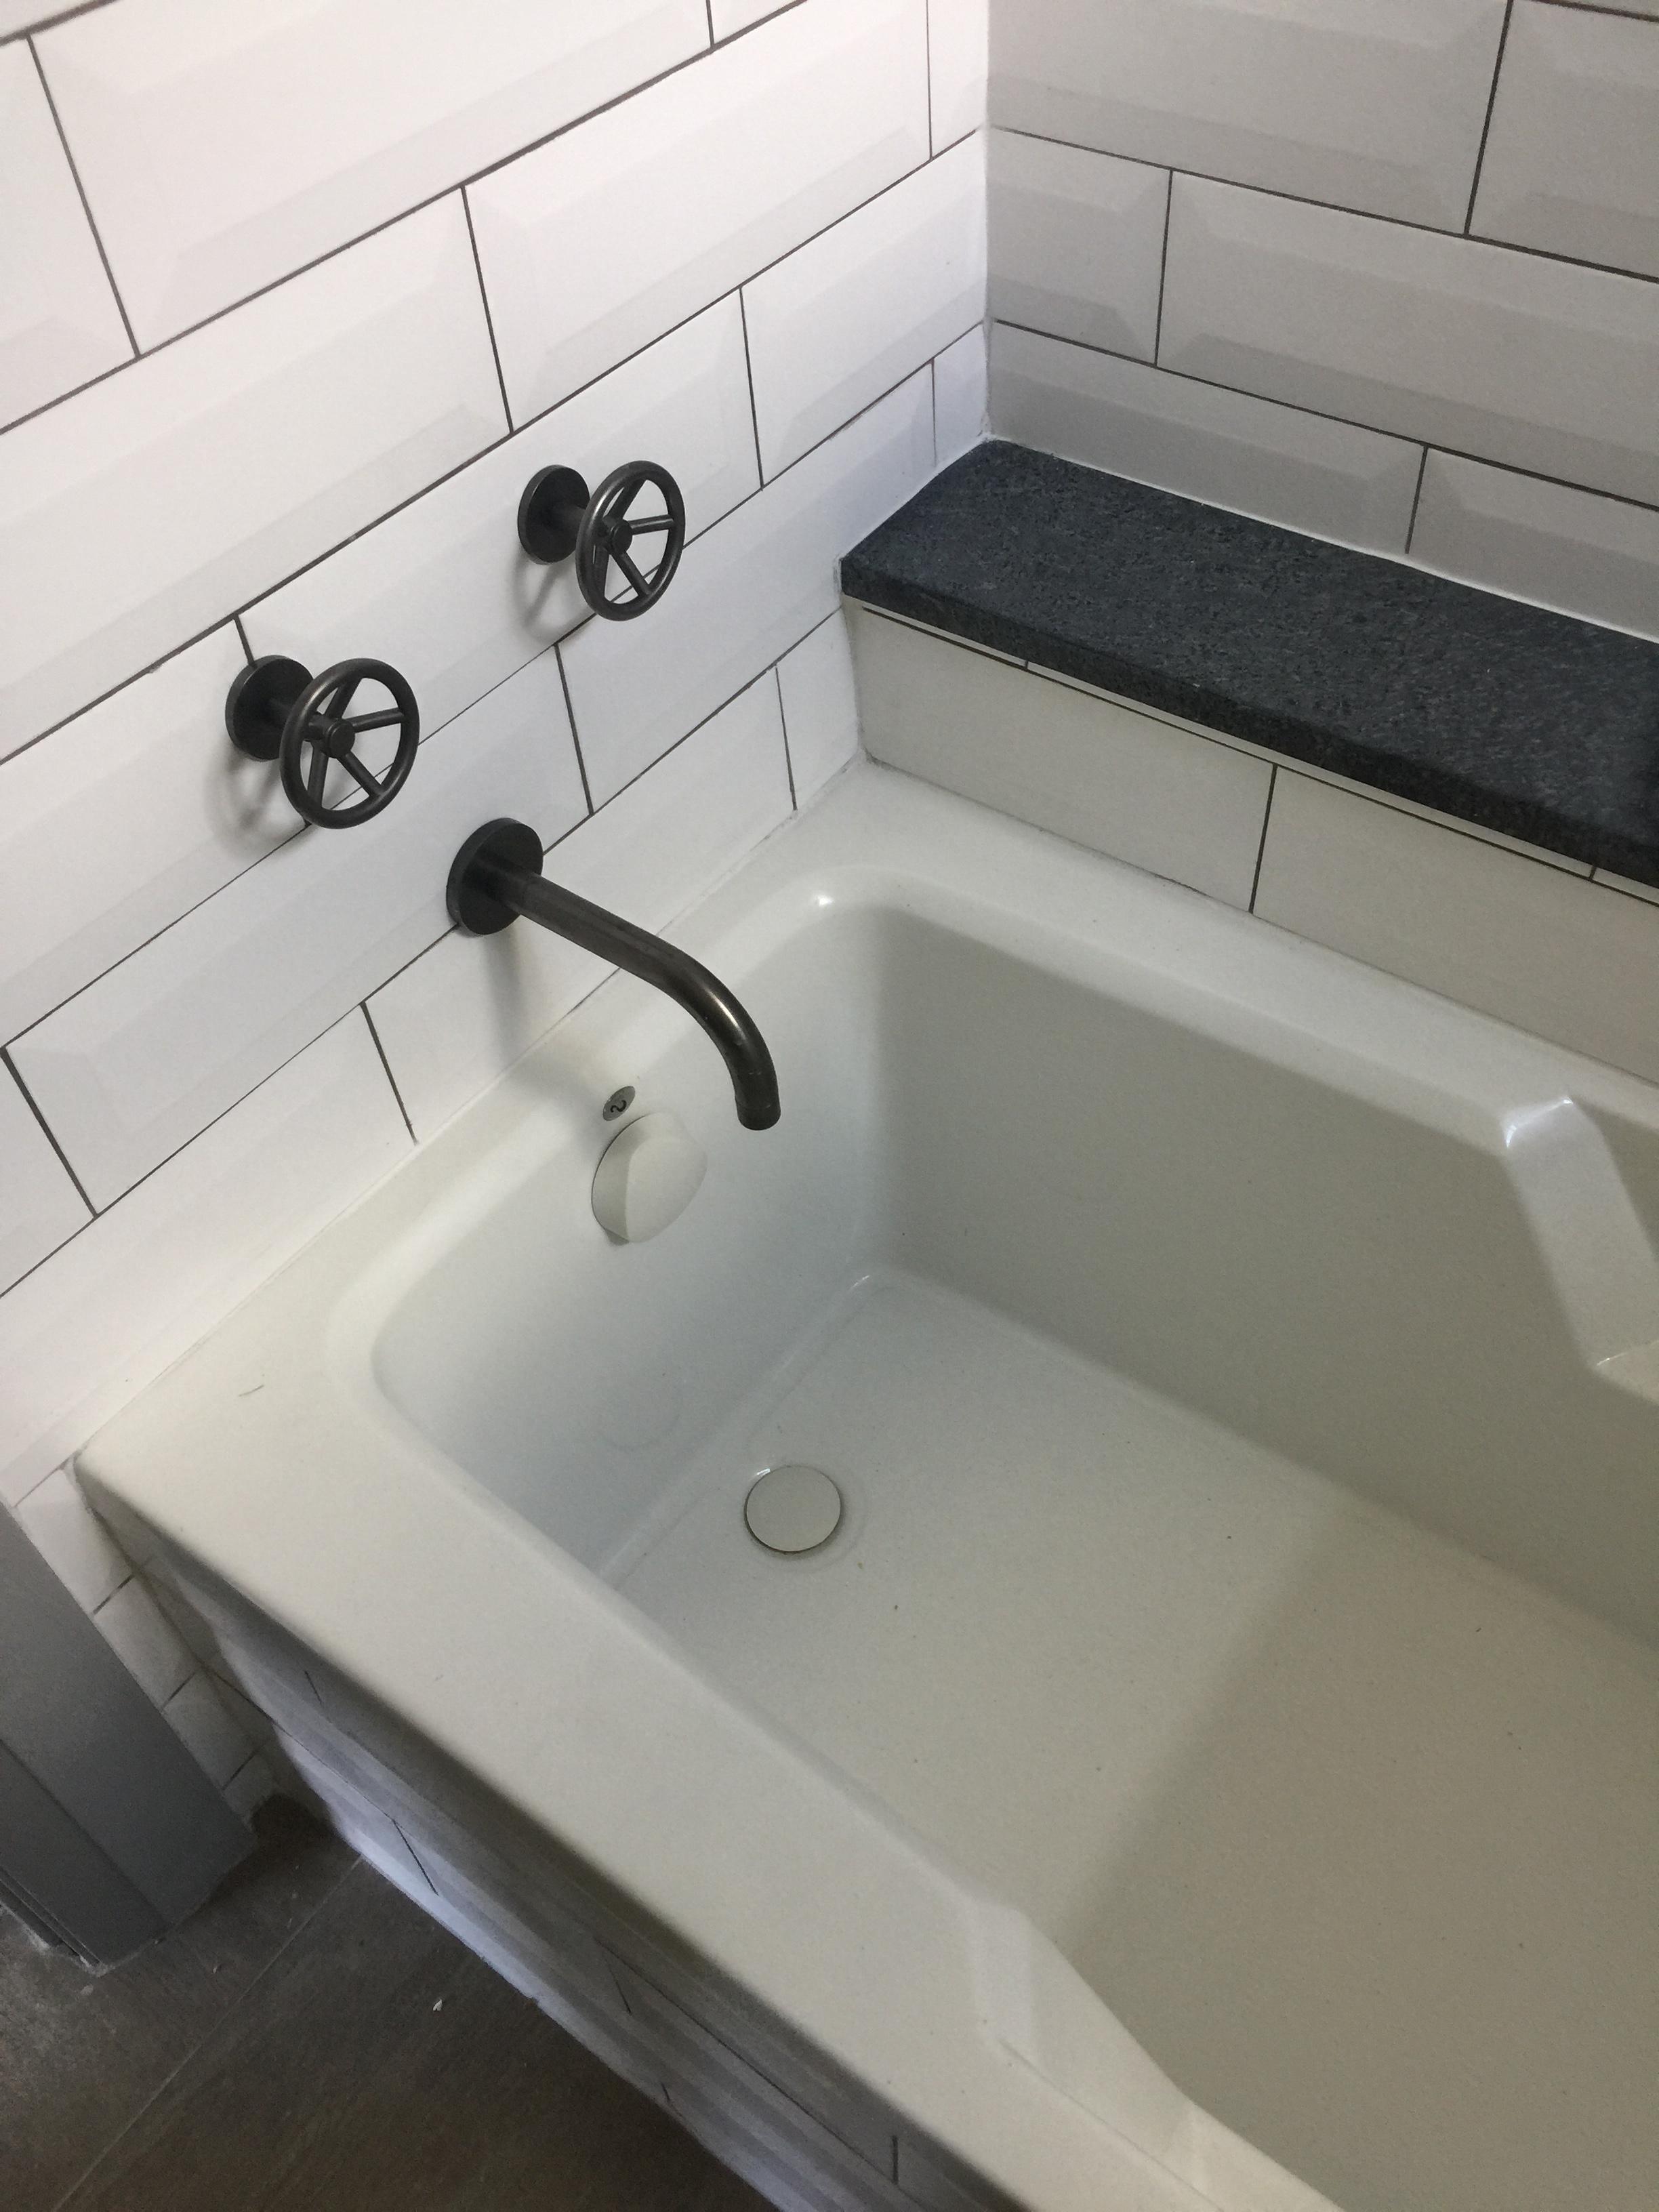 Cool faucet handles in the boy's bathroom tub - Shundra Harris Designer